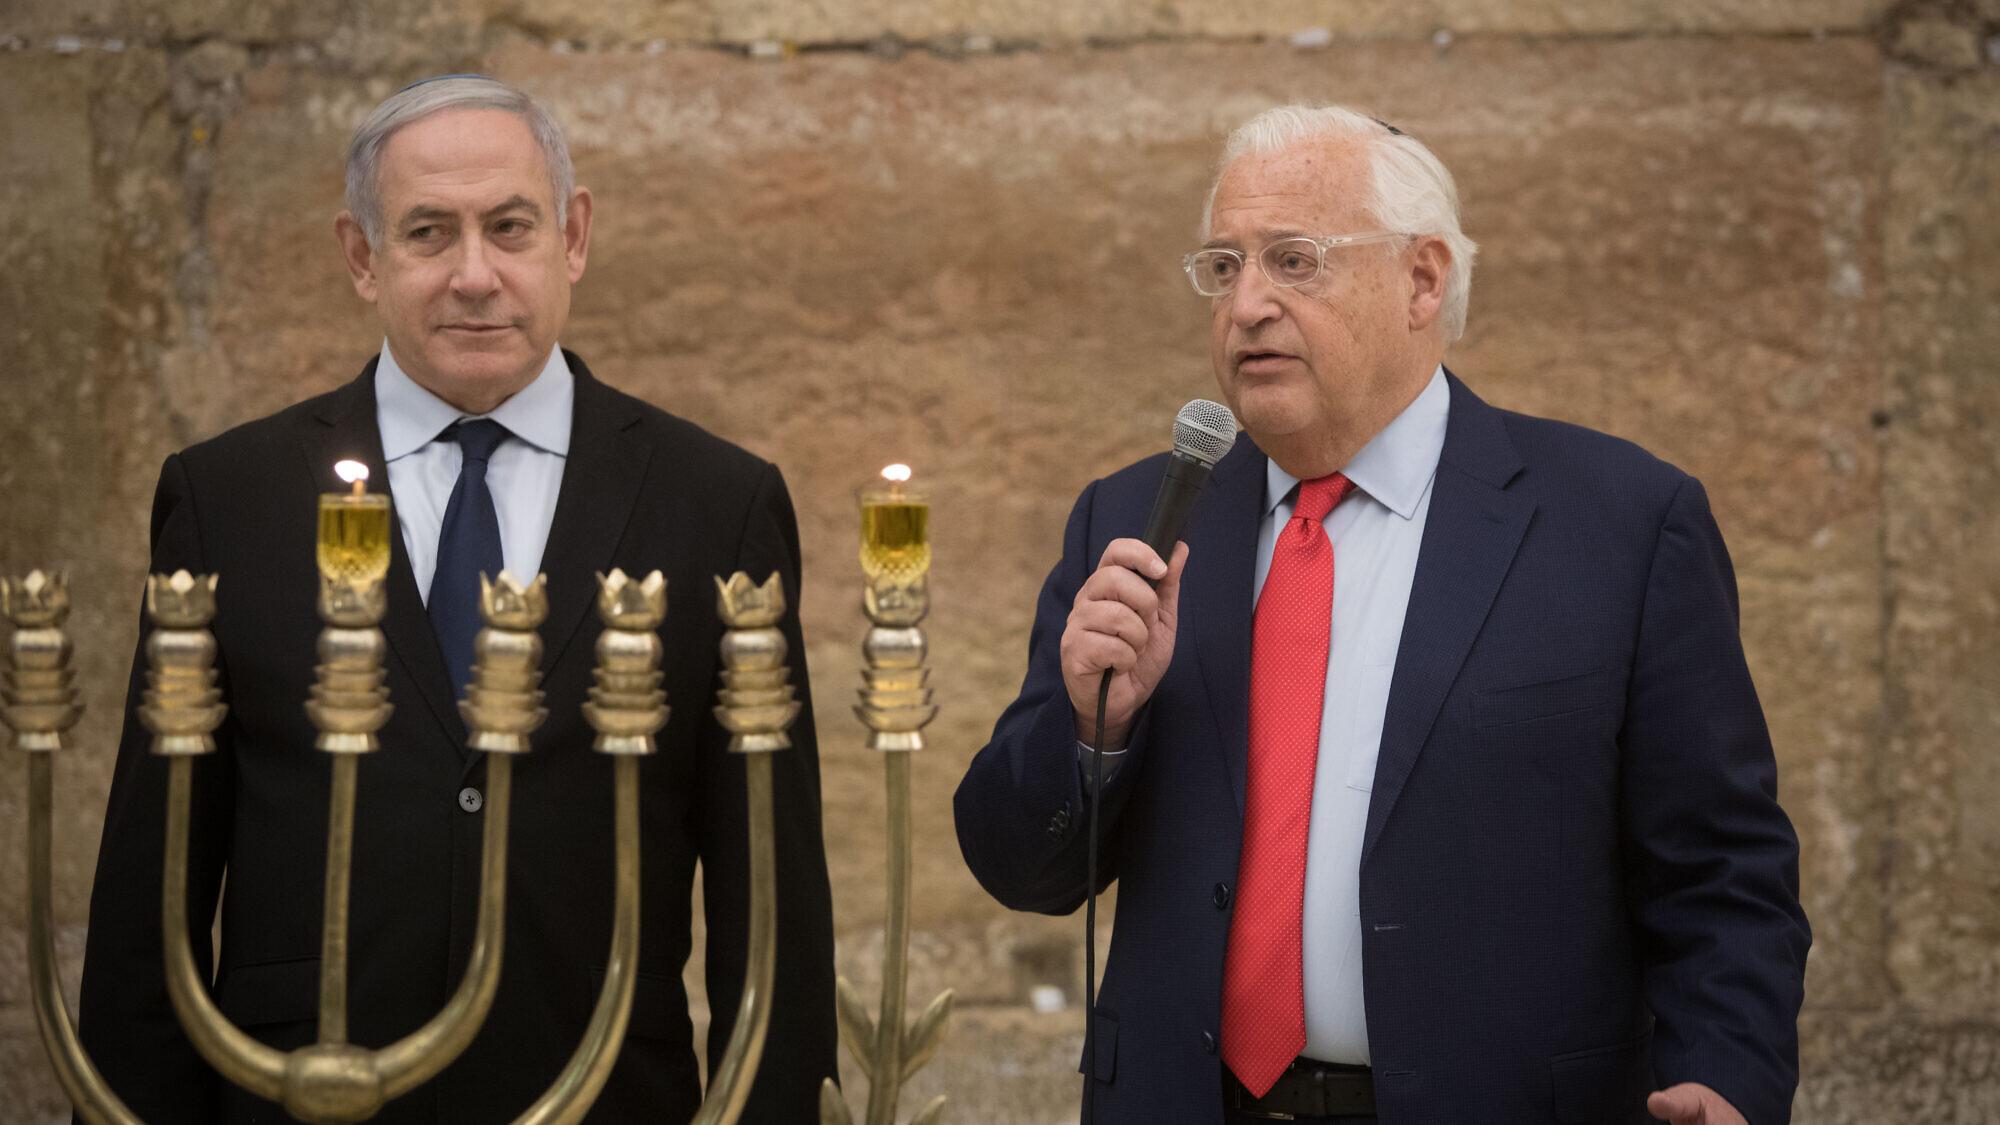 Israeli Prime Minister Benjamin Netanyahu and U.S. Ambassador to Israel David Friedman light Hanukkah candles at the Western Wall on December 22, 2019. Photo by Noam Revkin Fenton/Flash90.